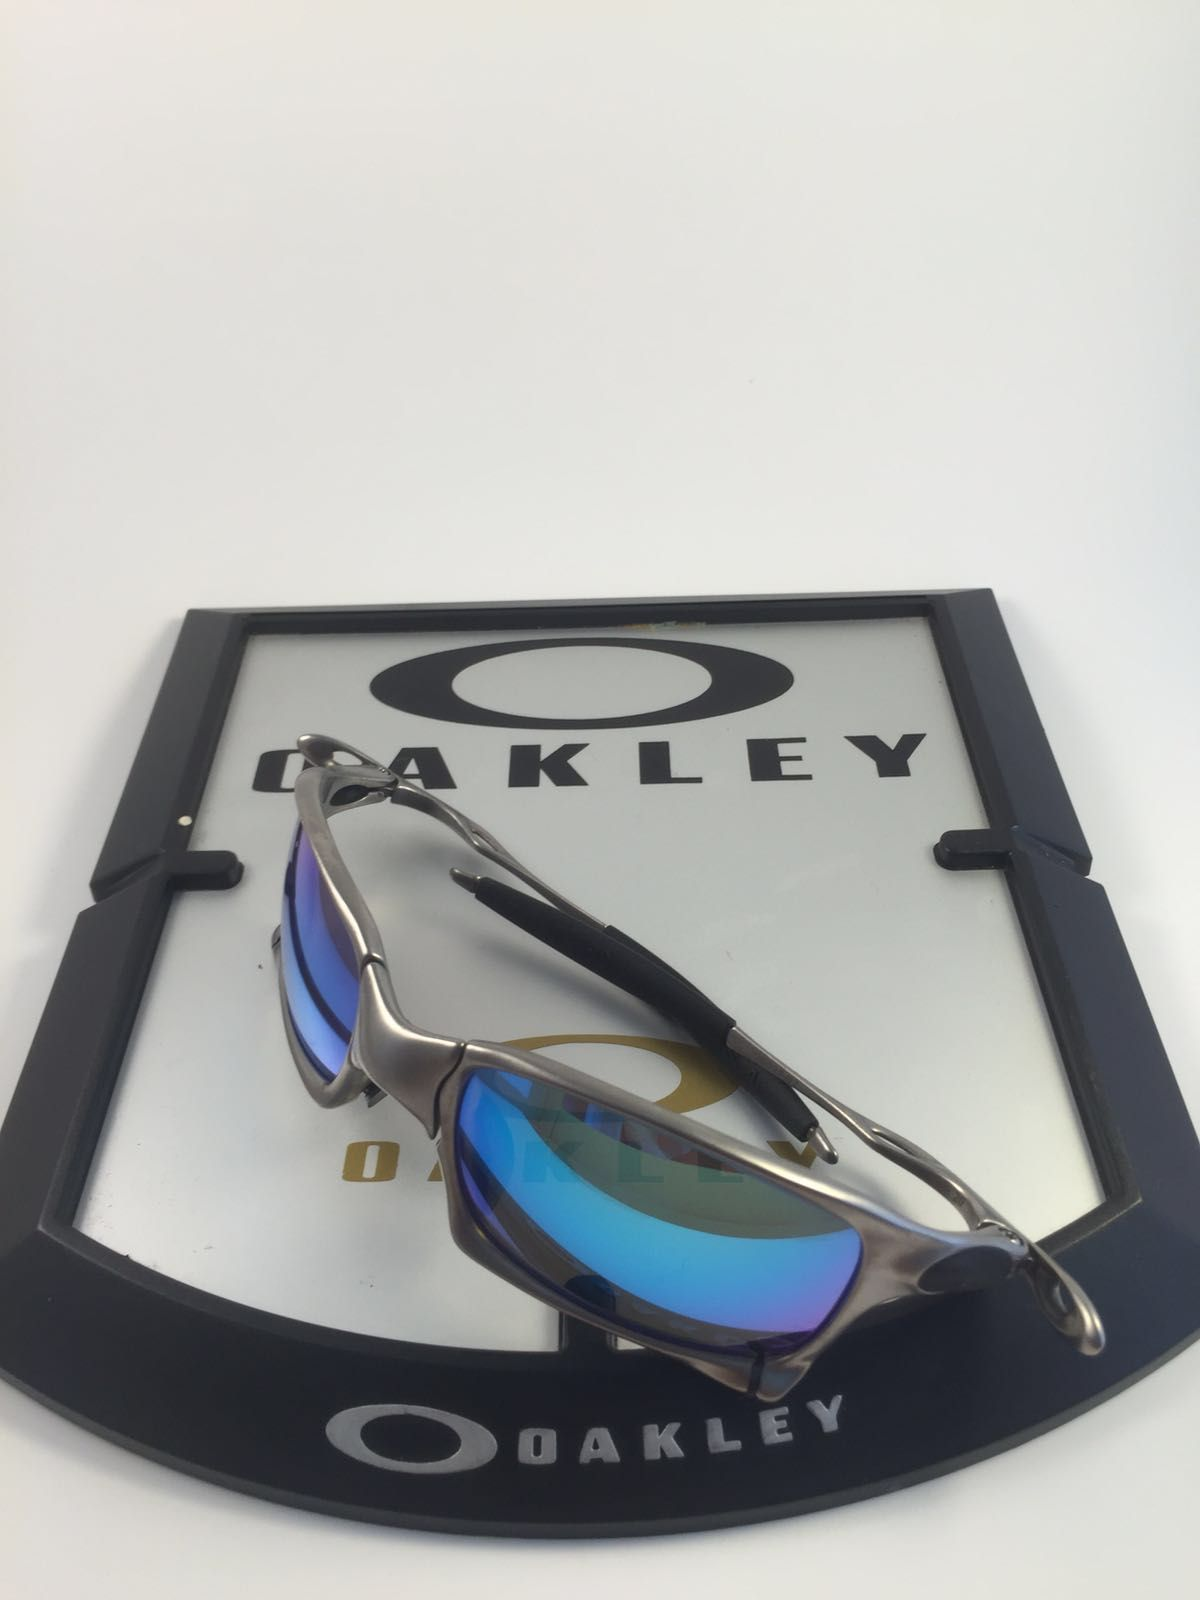 oakley x squared plasma - 6cffbe41-e828-4cbd-94c9-4635a44383f1.jpeg